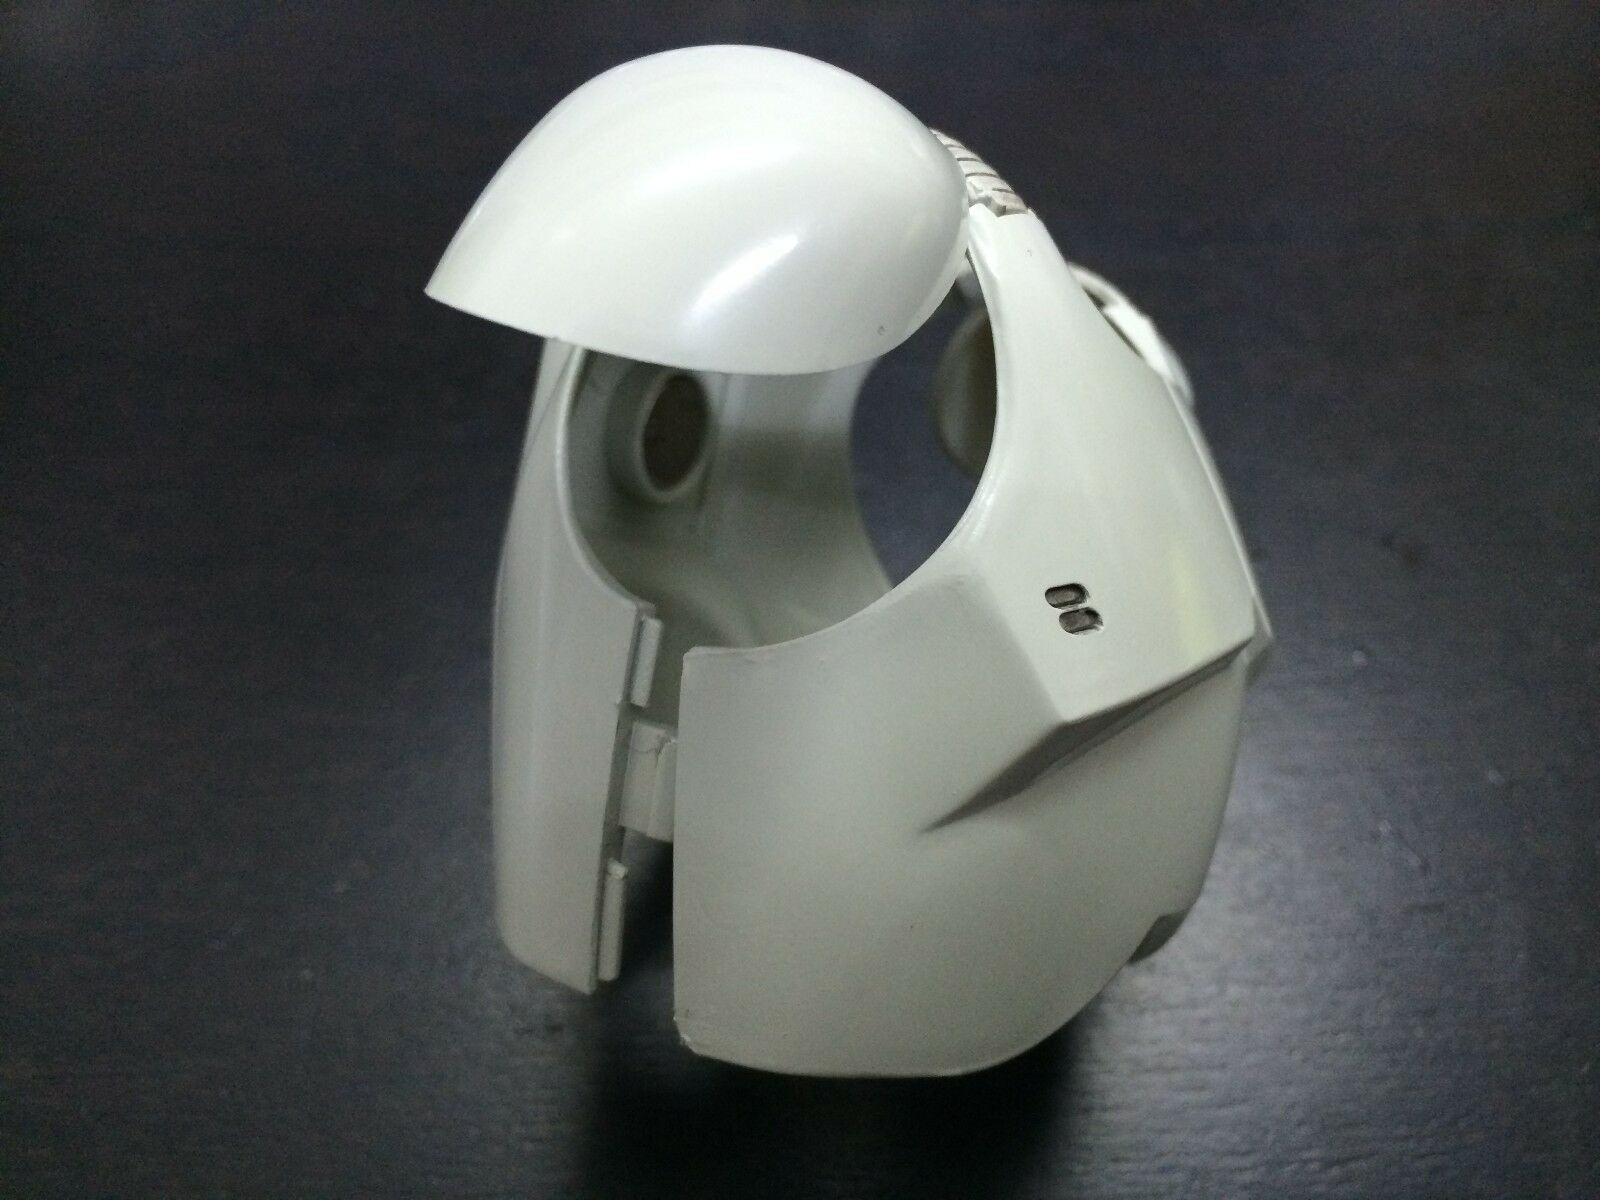 Sideshow Sideshow Sideshow 1 6 Star Wars White Clone Trooper 2.0 Shiny Perfect Chest Armor 8cf0e8